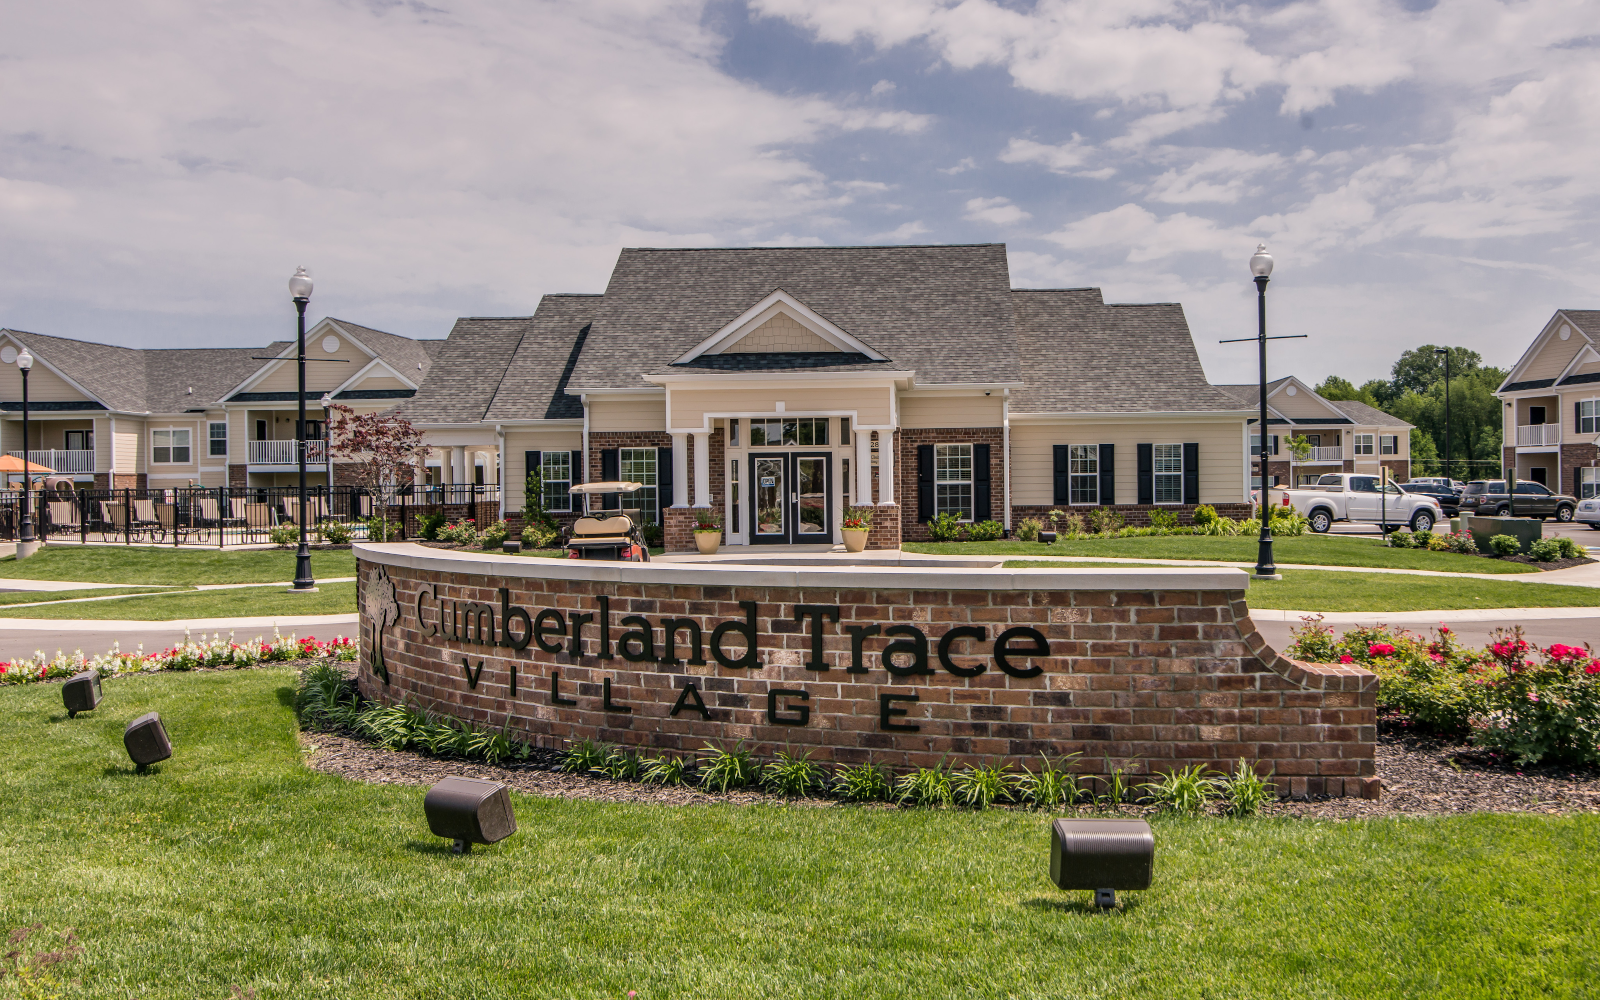 Cumberland Trace Village Apartments